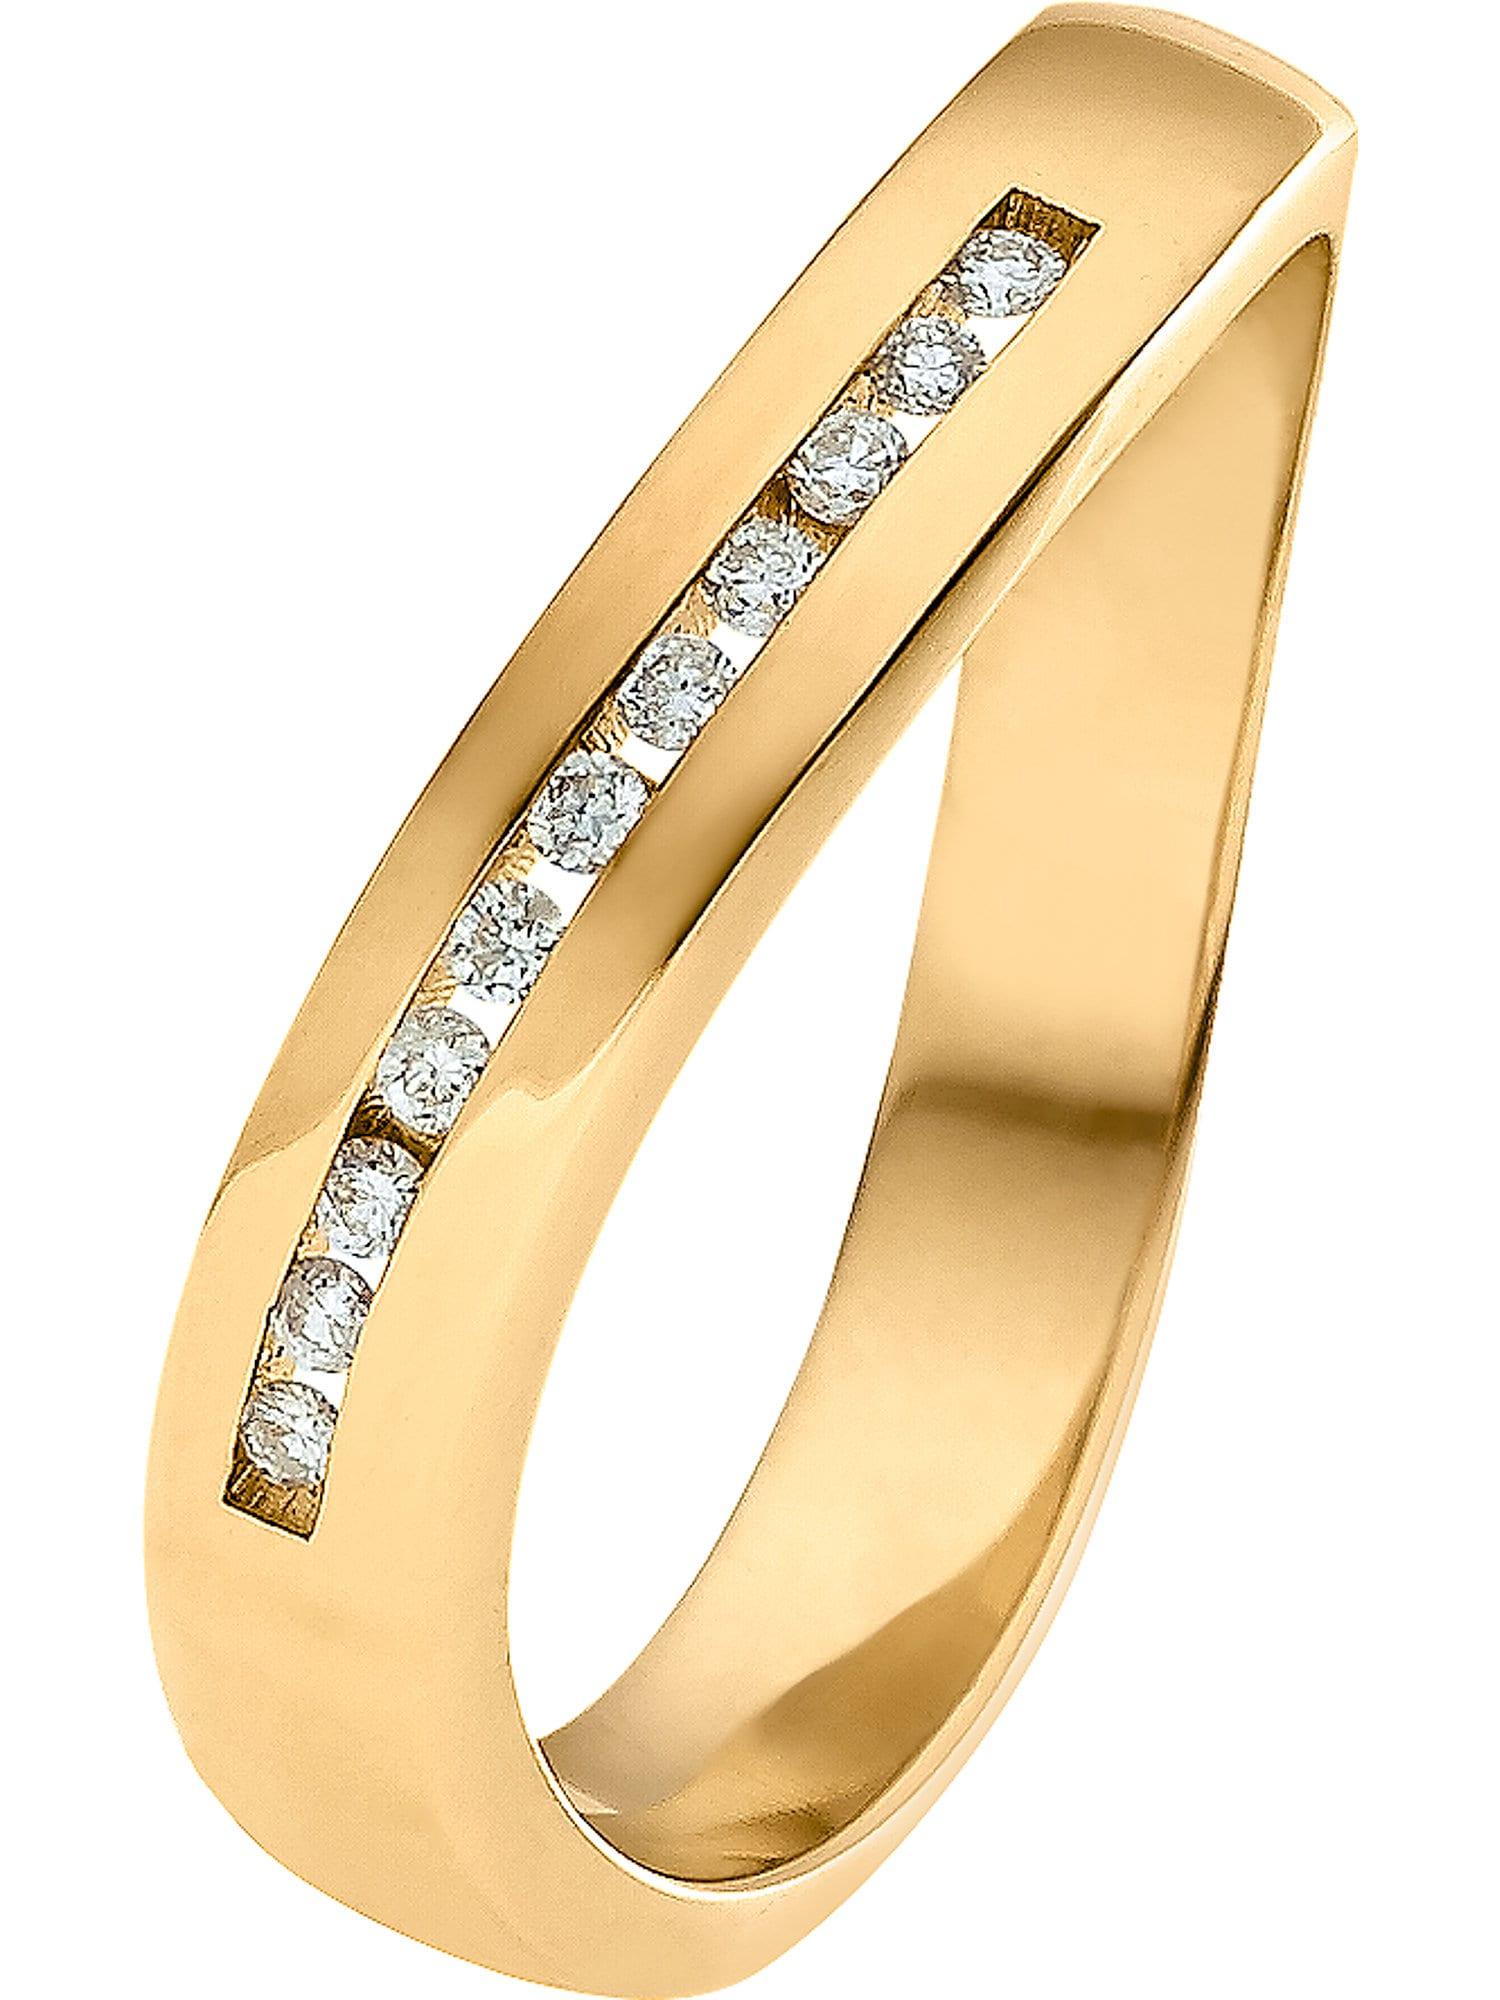 Damen Christ Ring gold, grau | 04006175723450